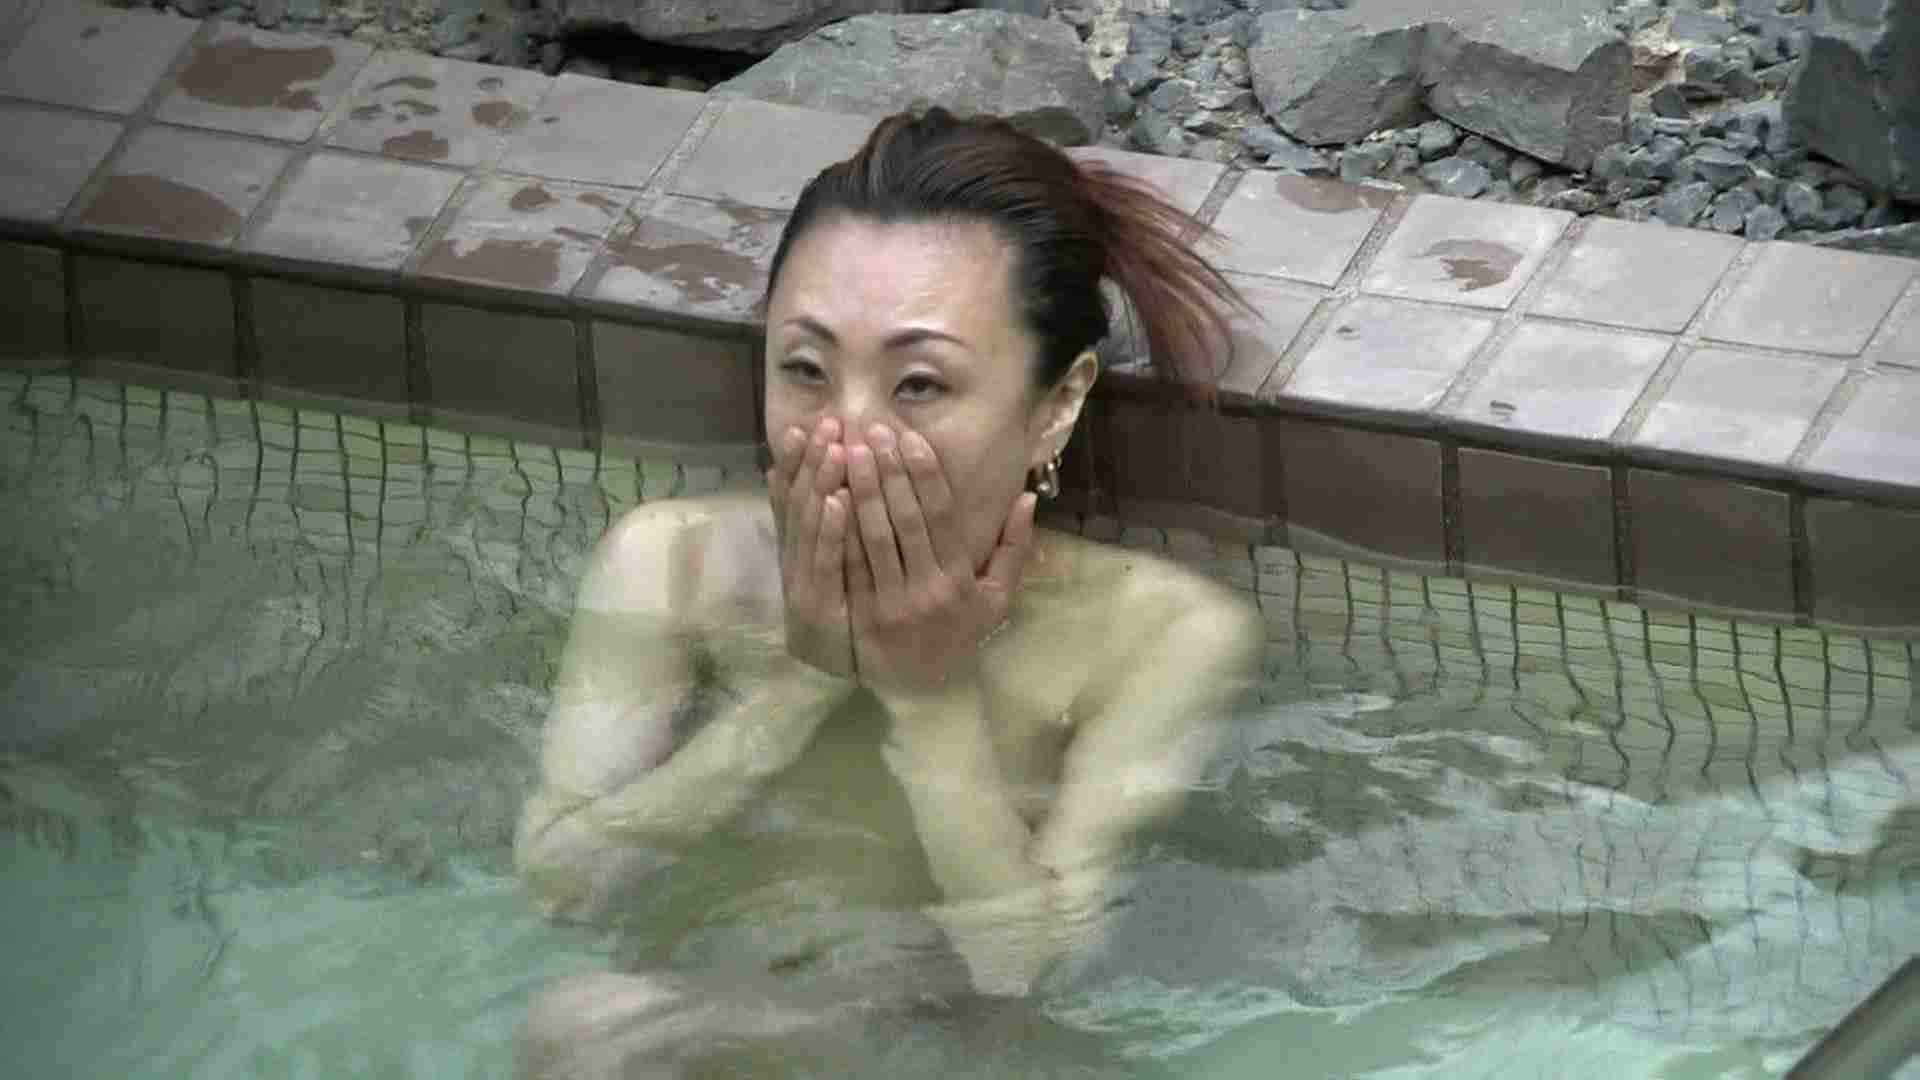 Aquaな露天風呂Vol.654 HなOL | 盗撮  60pic 40